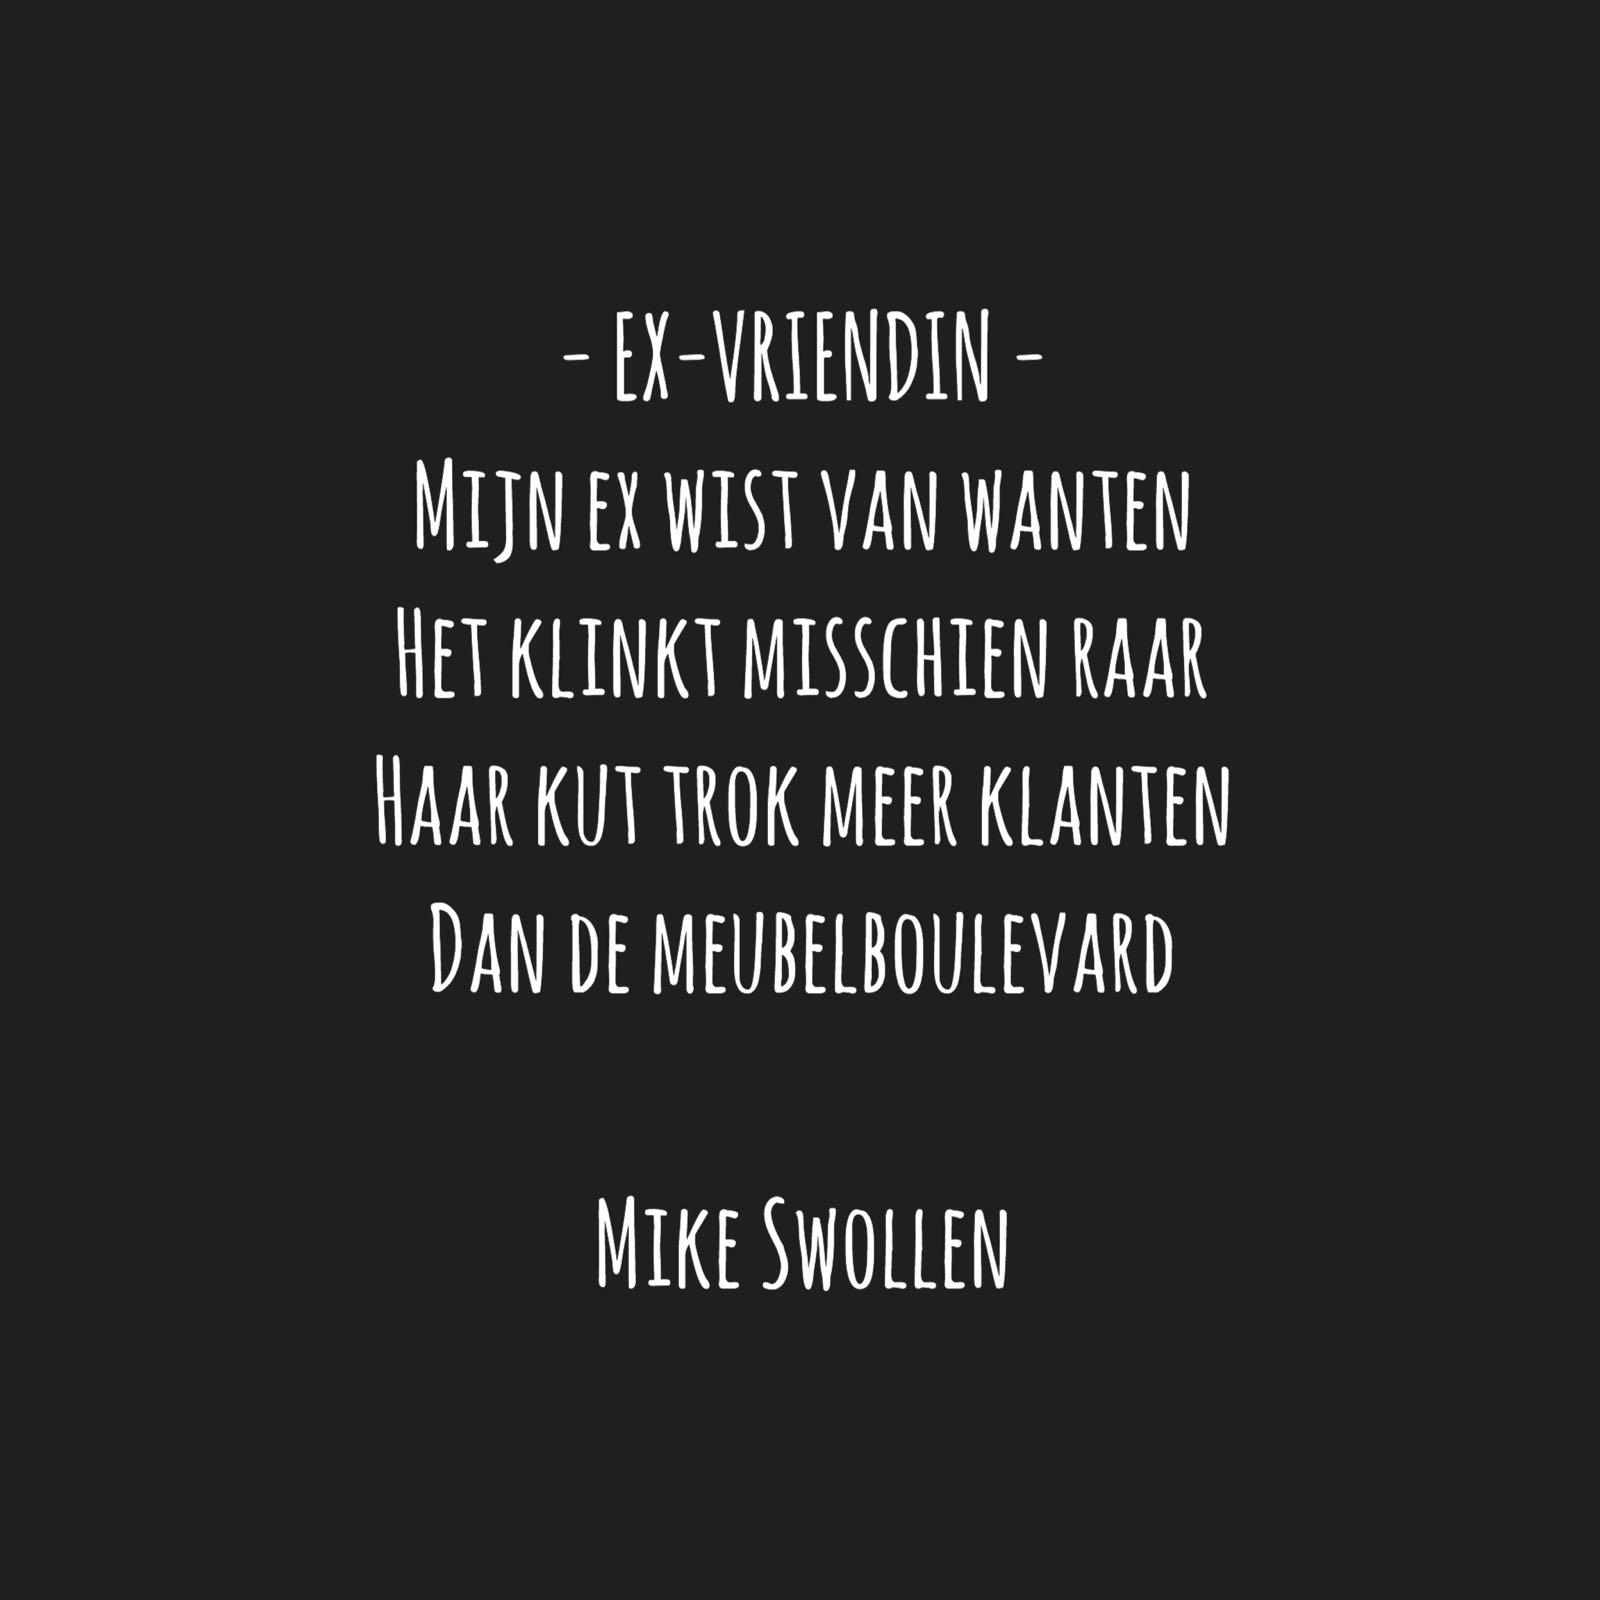 New FOK.nl / Weblog / Gedicht van de dag: Ex-vriendin @FD94